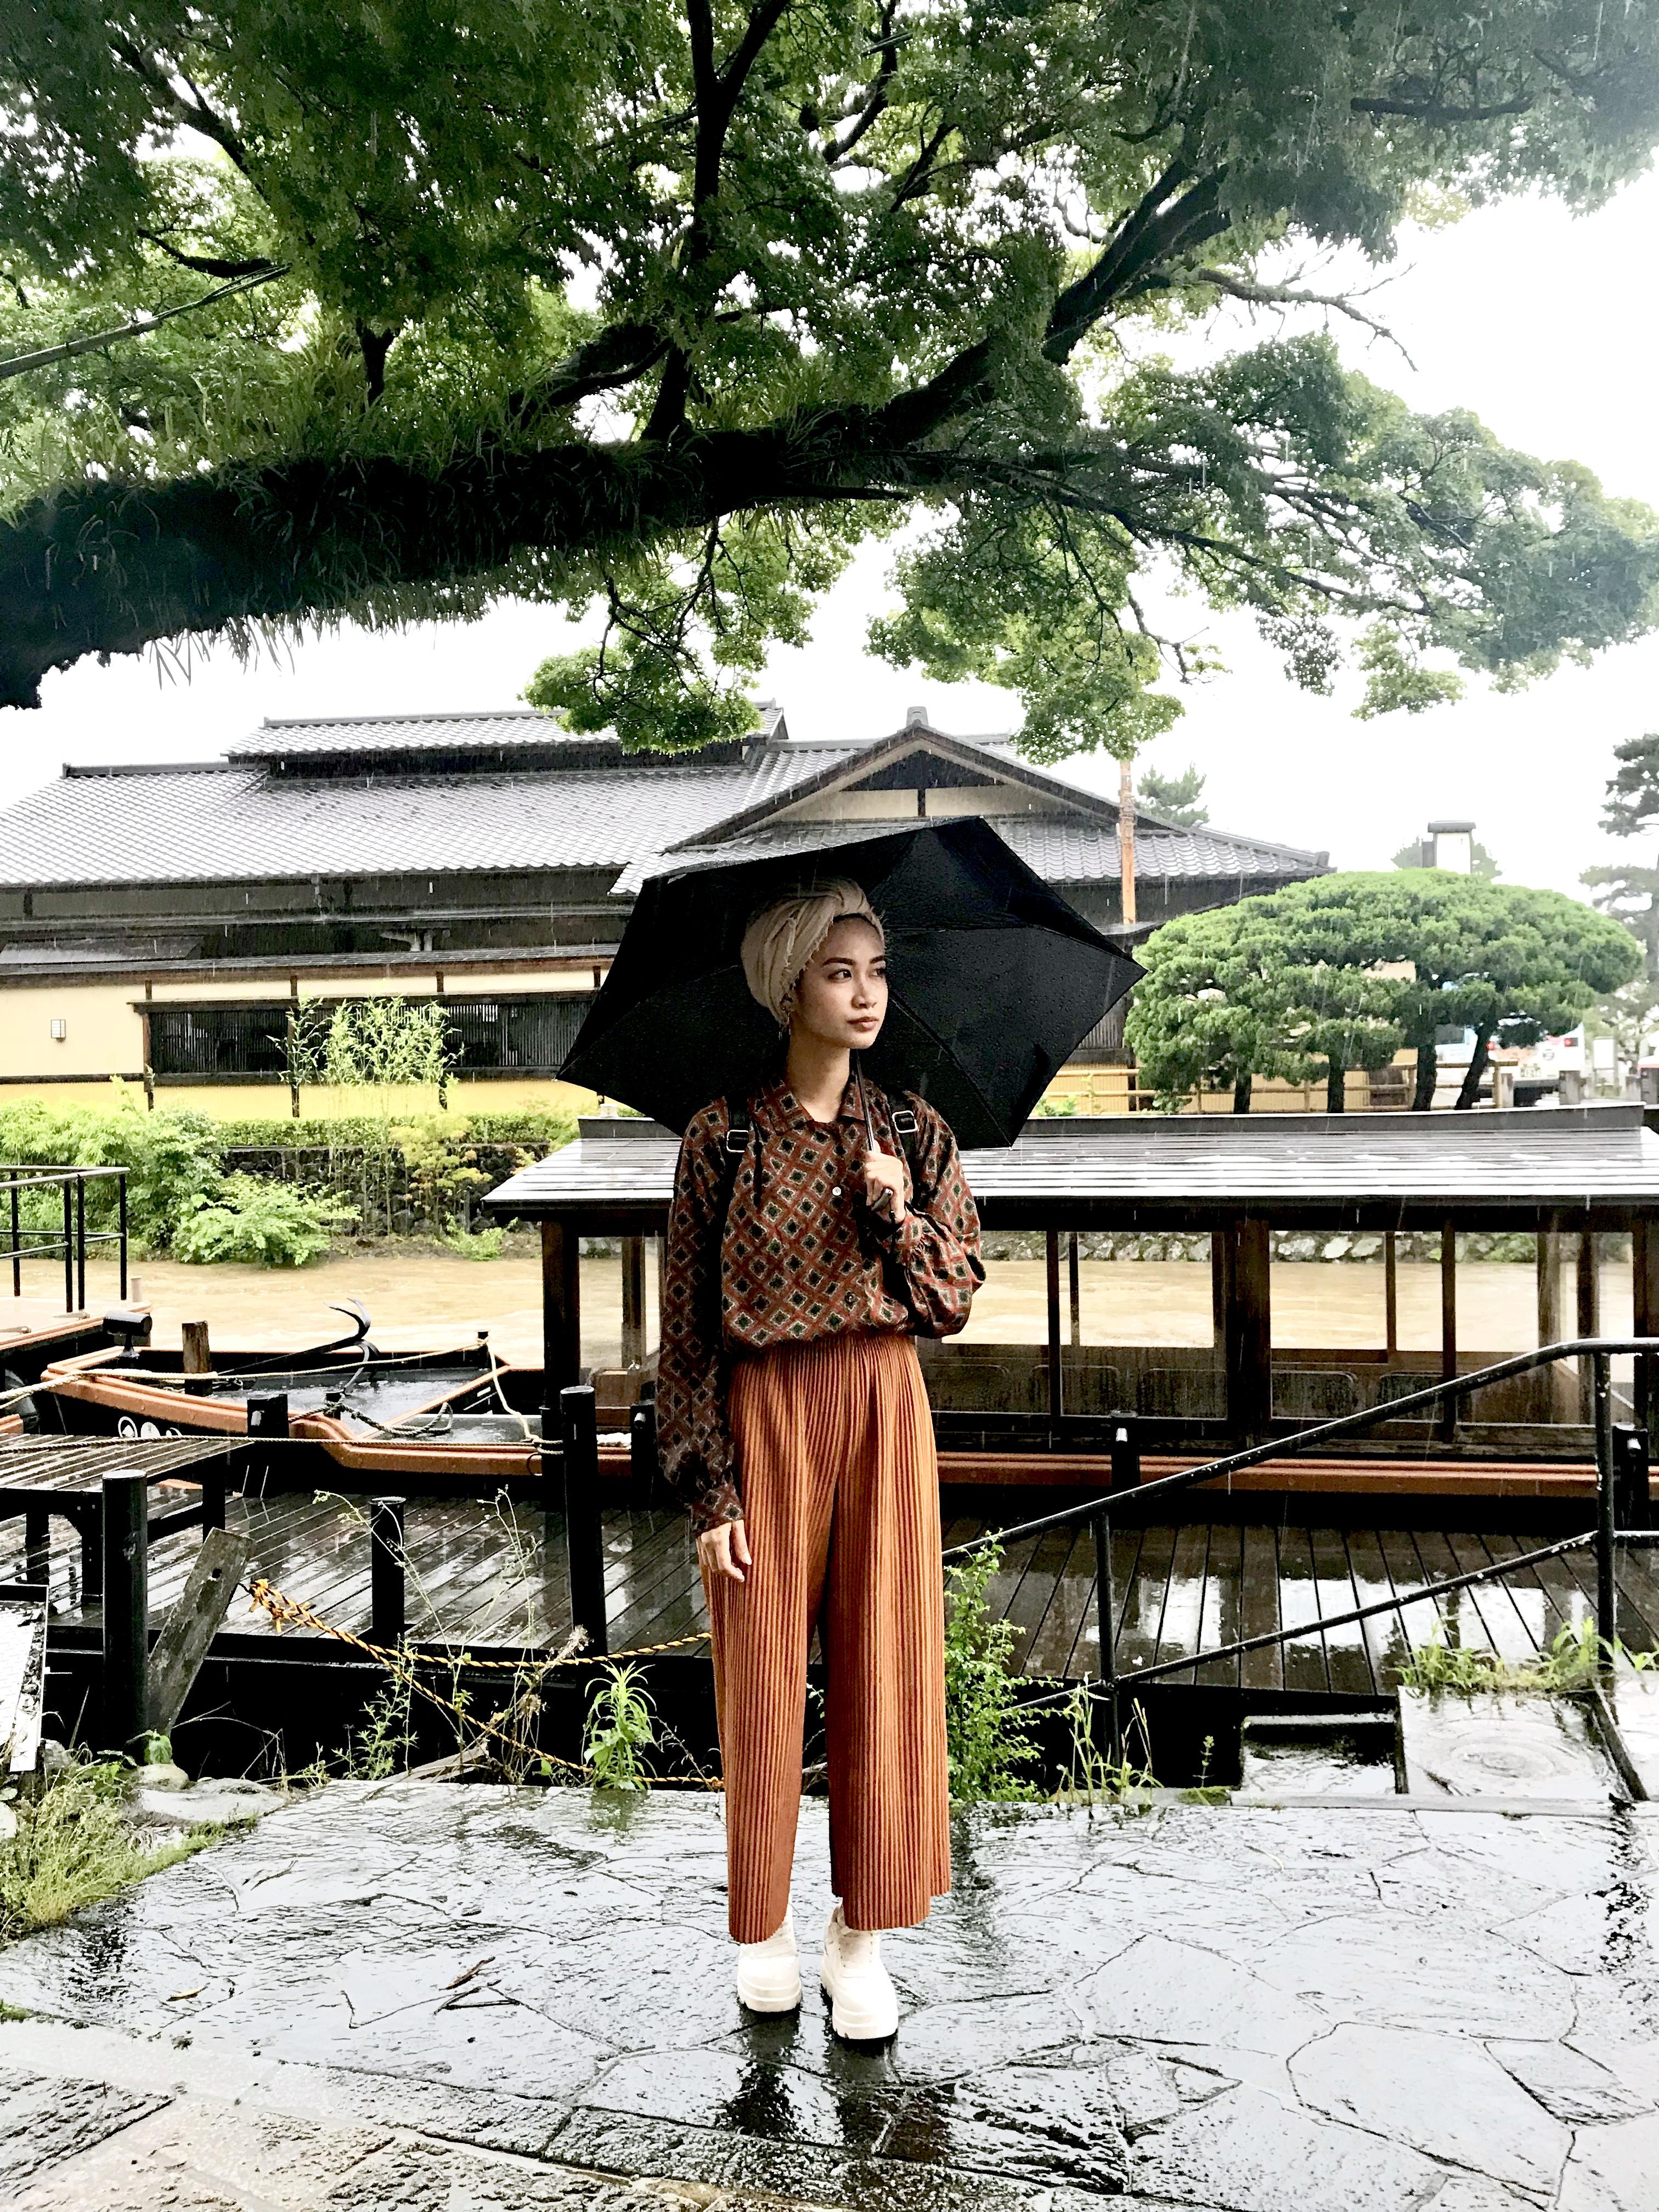 Kyoto, Japan, July 2018